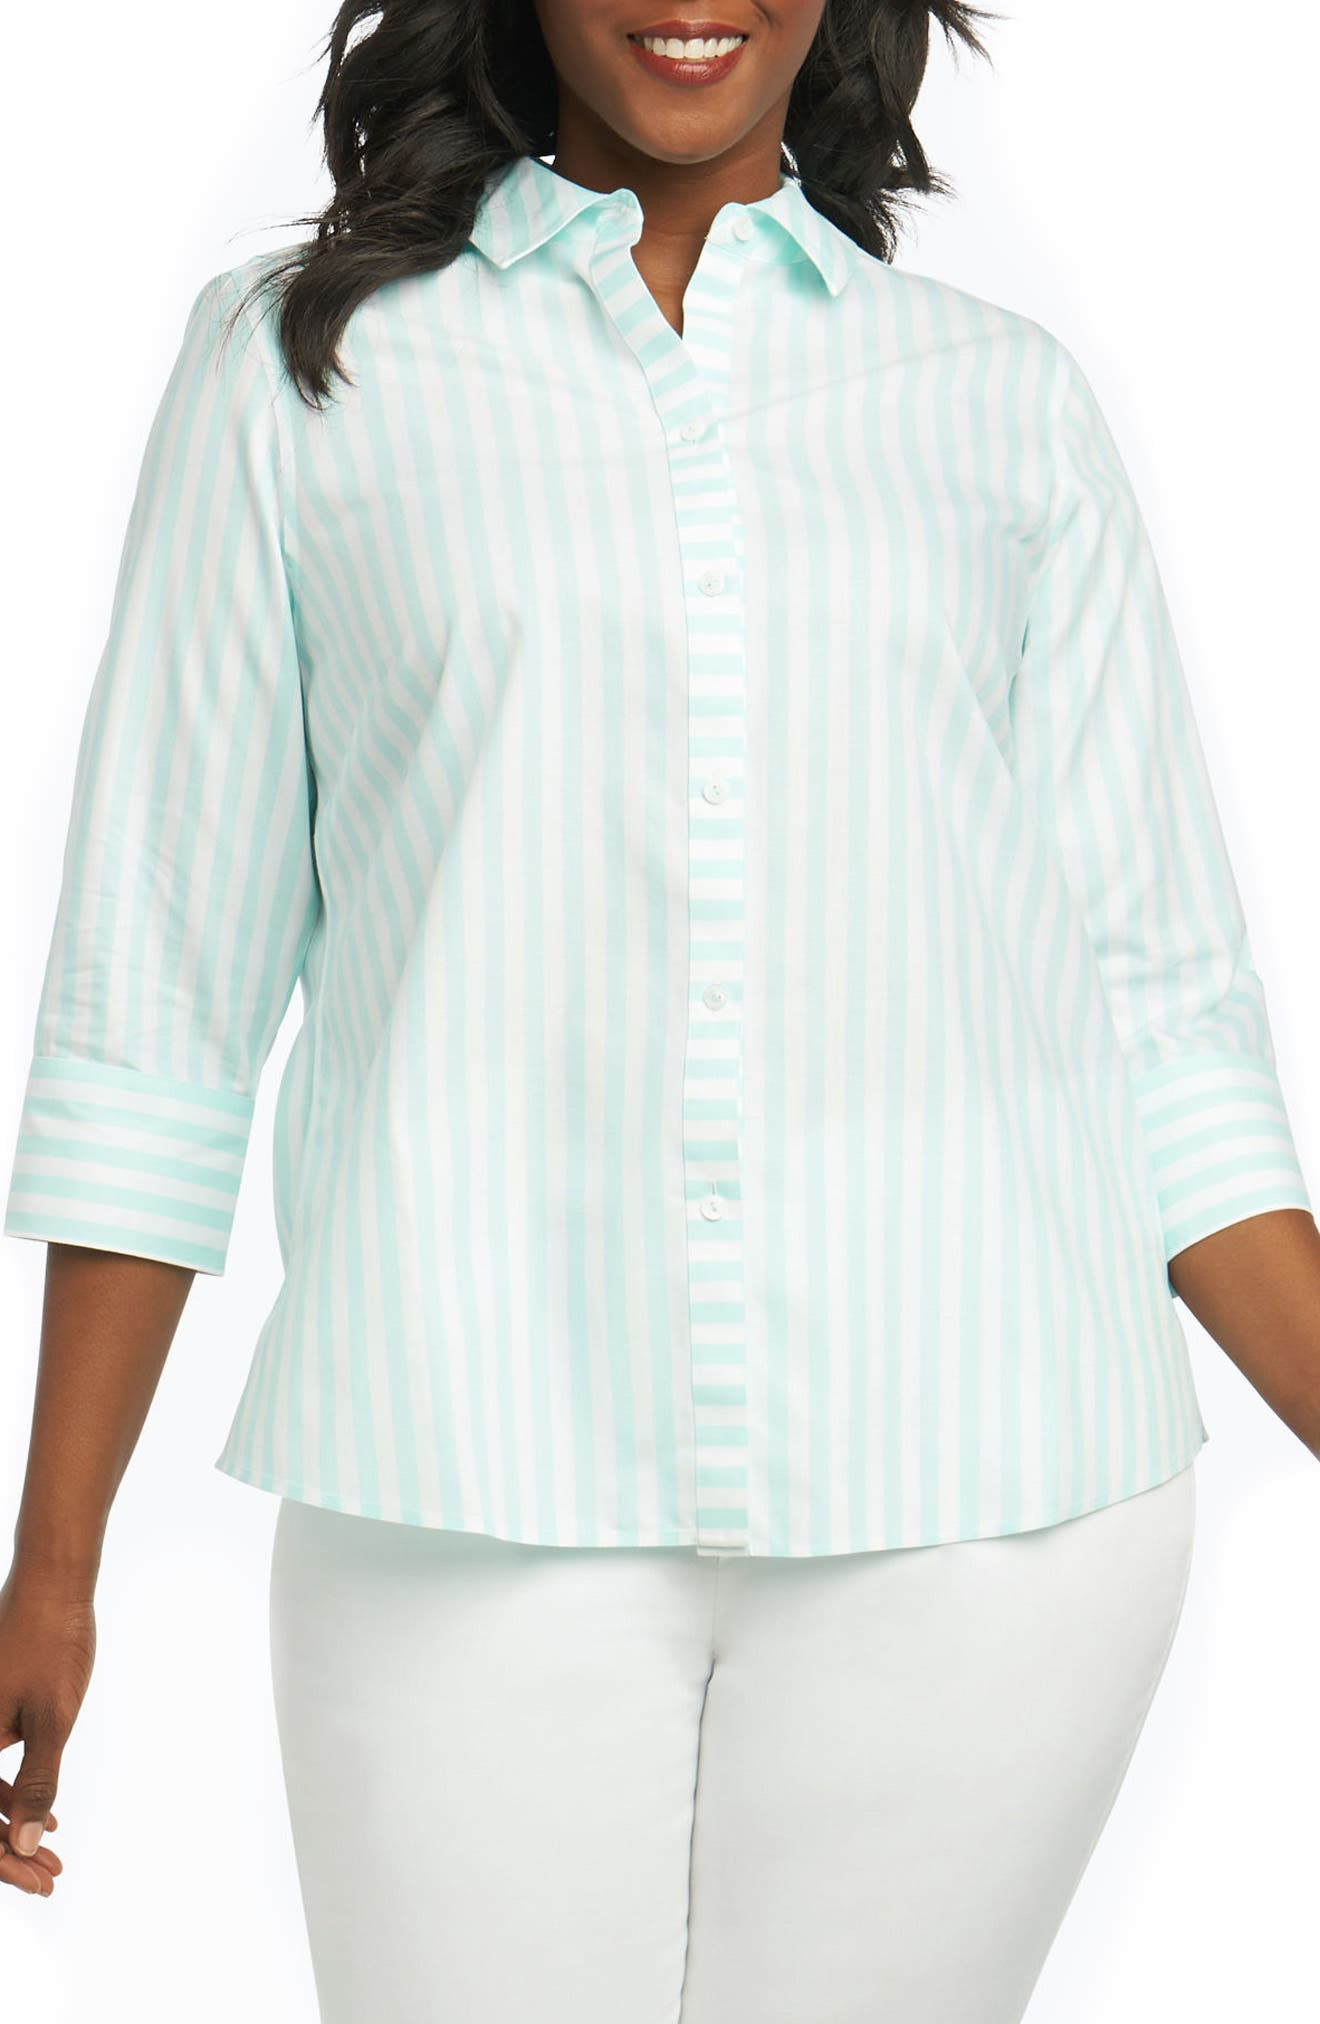 Ava Royal Oxford Stripe Shirt,                             Main thumbnail 1, color,                             455